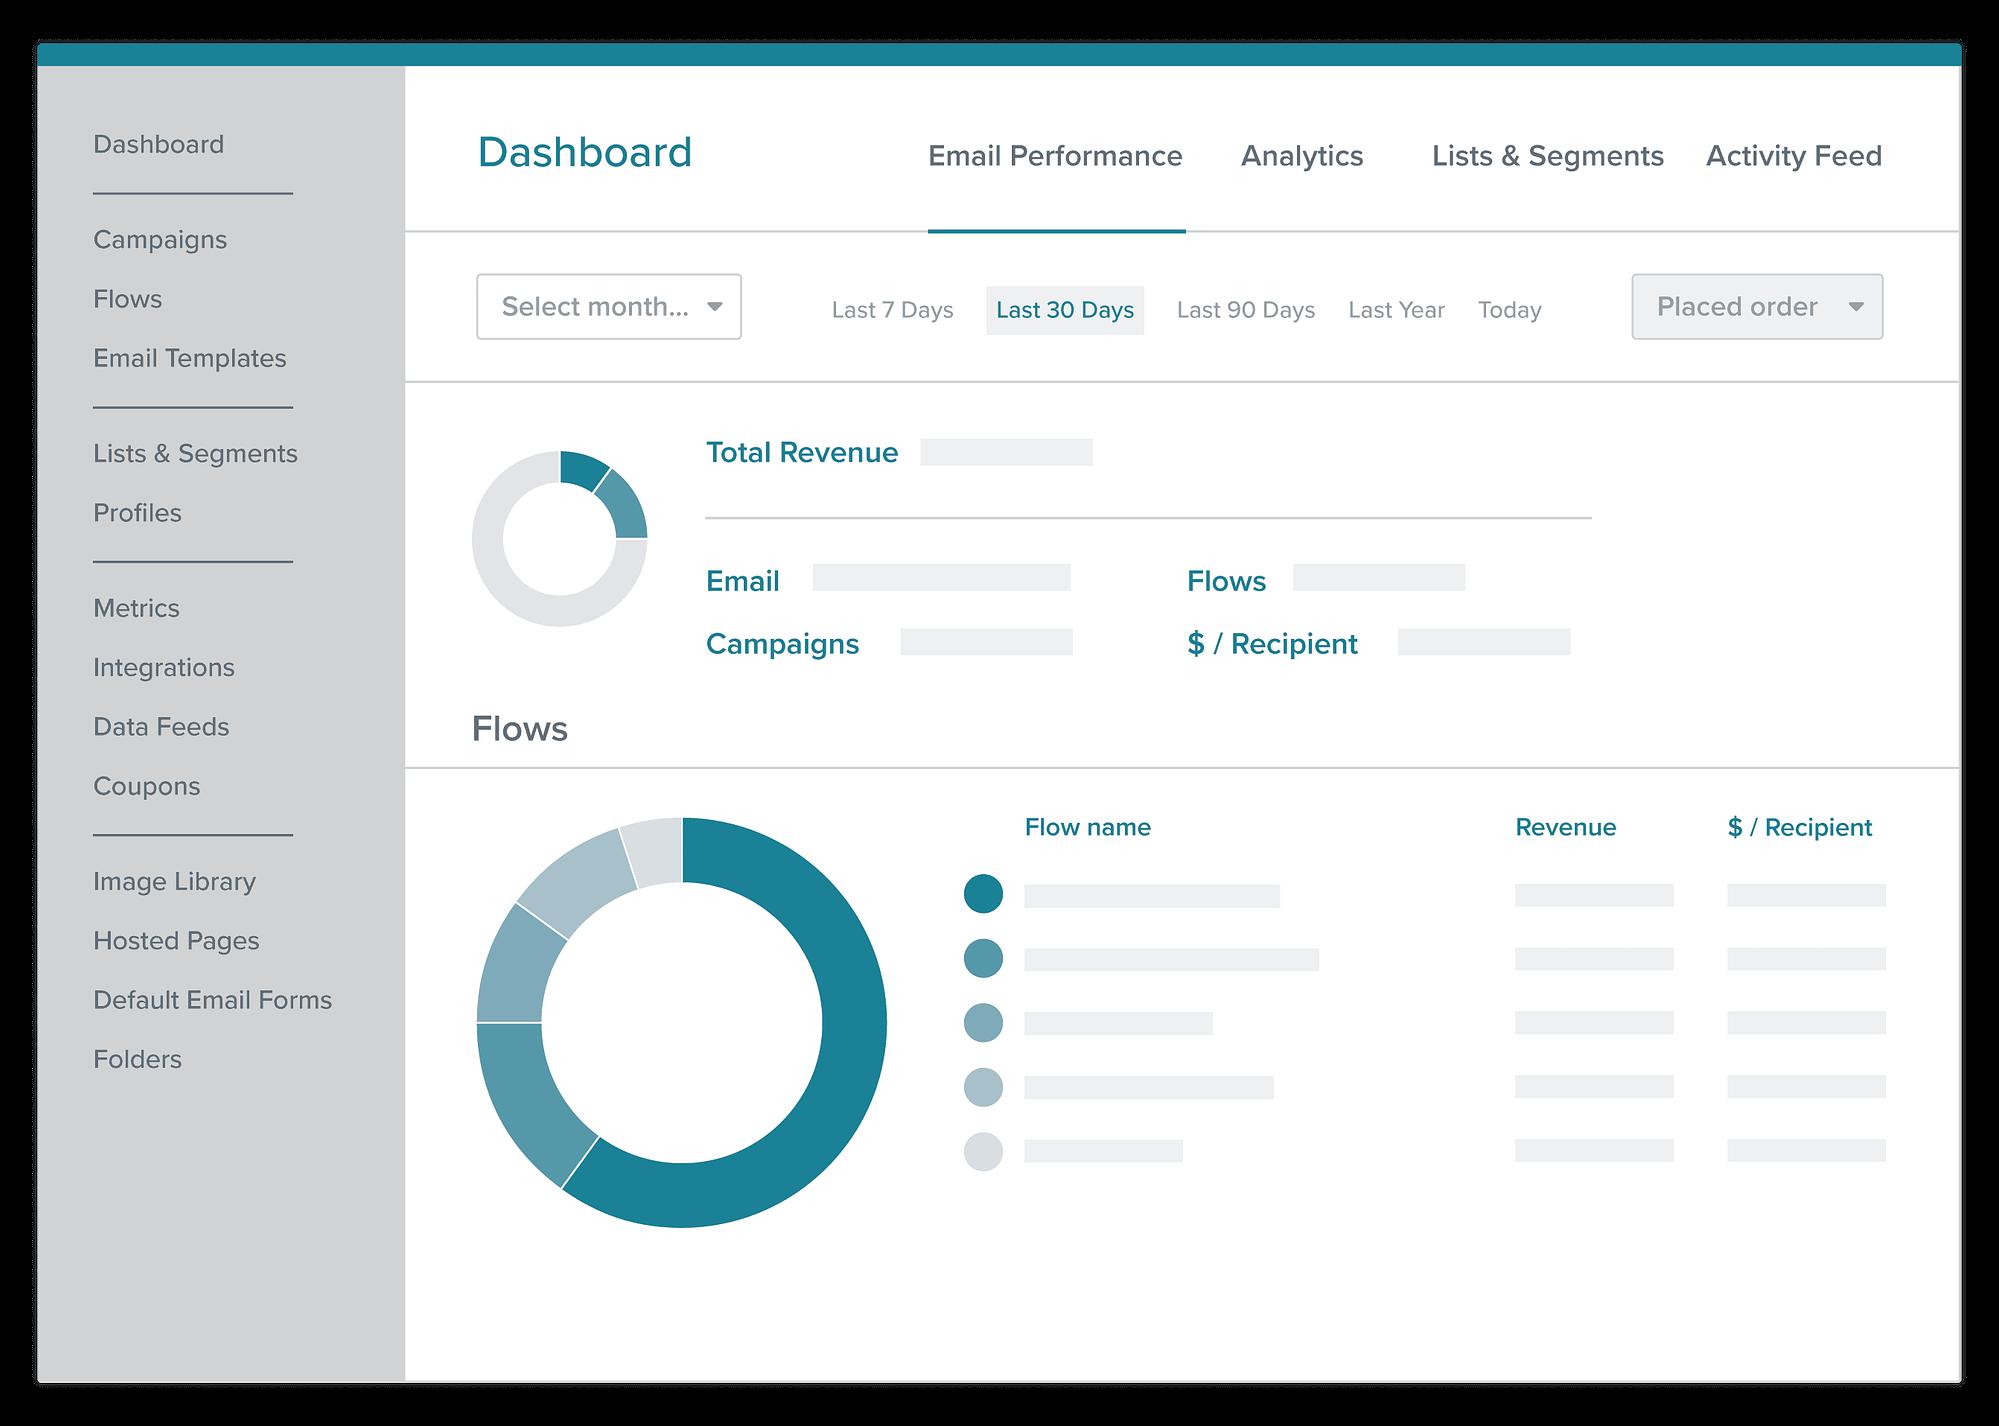 klaviyo-netsuite-ecommerce-integration-dashboard-image.png